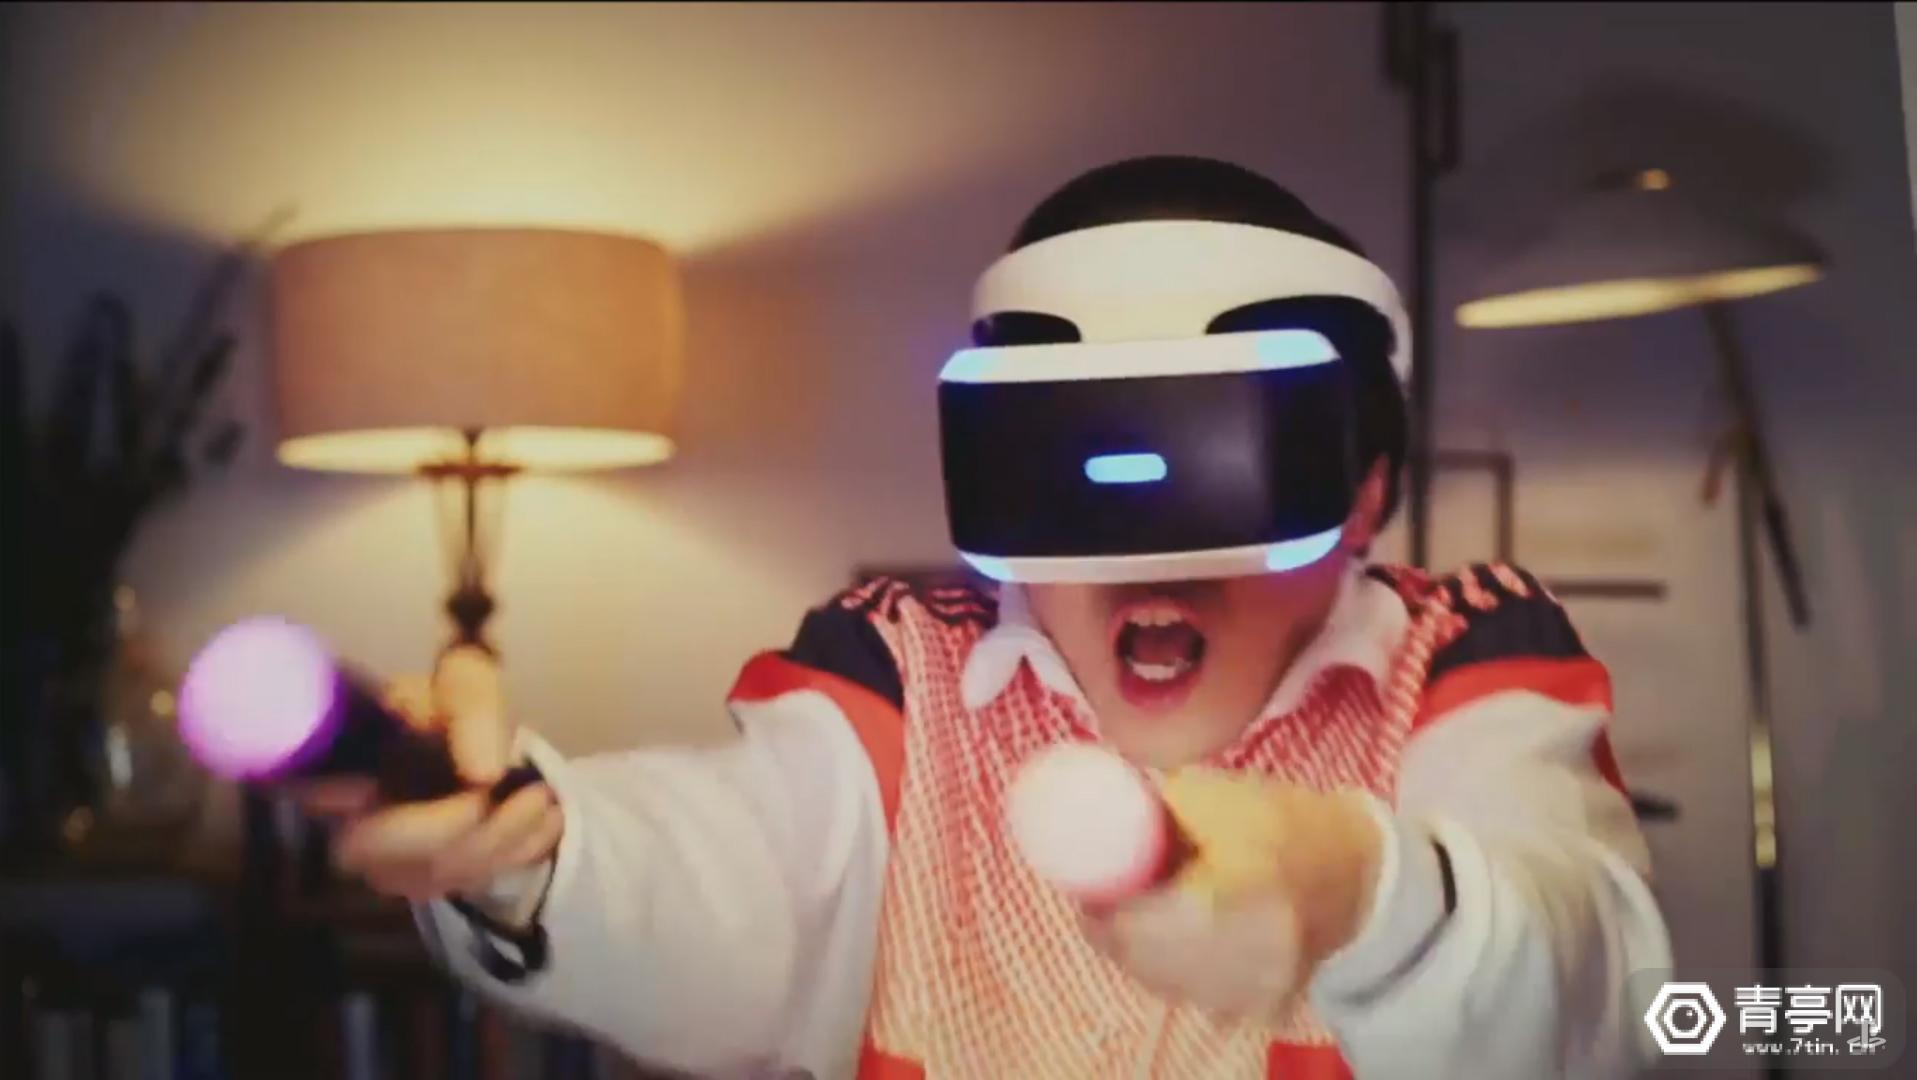 Immersion向索尼授权体感专利,或用于PS VR手柄